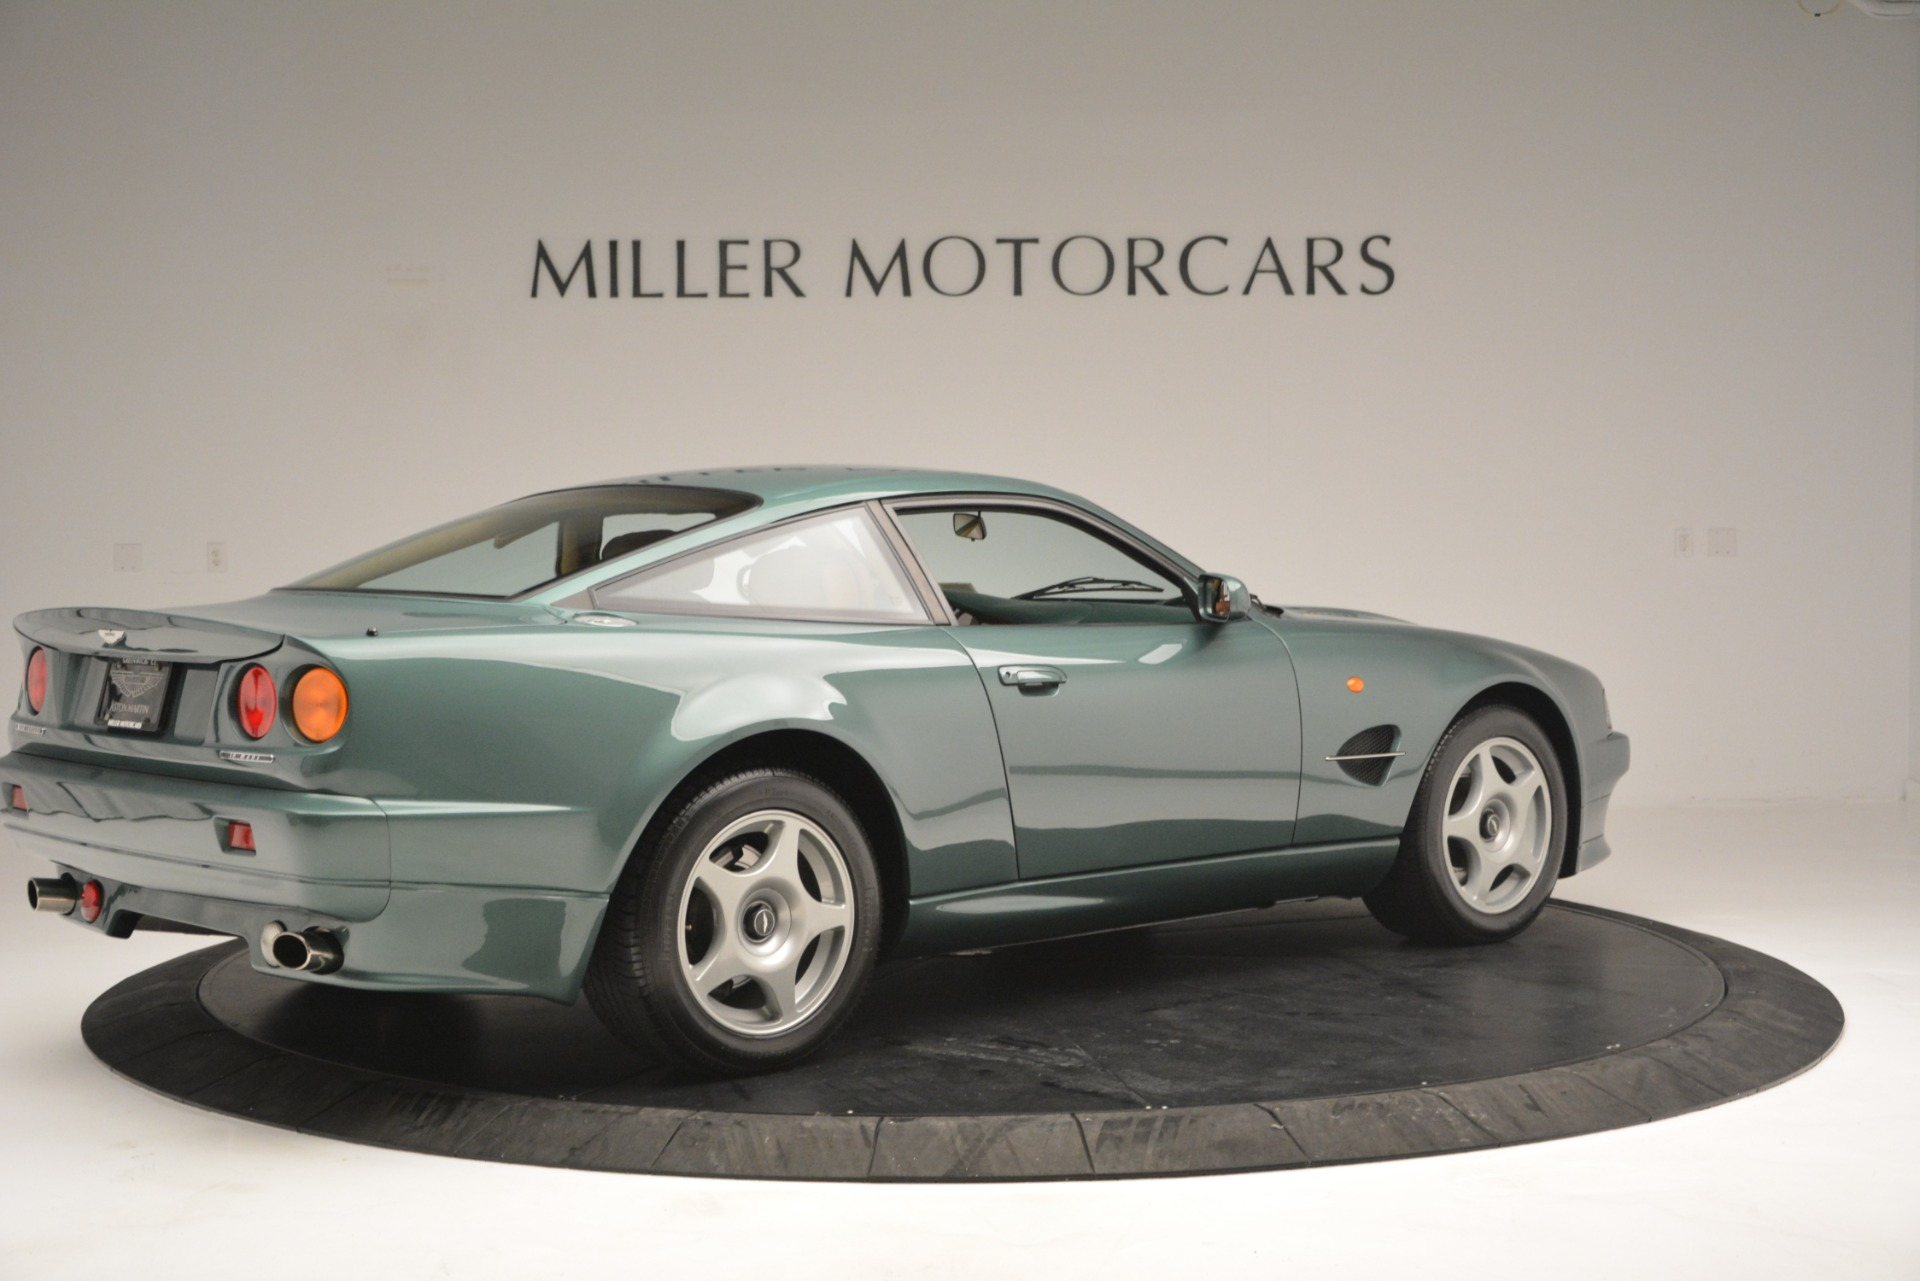 Used 1999 Aston Martin V8 Vantage Le Mans V600 Coupe For Sale In Westport, CT 2789_p9